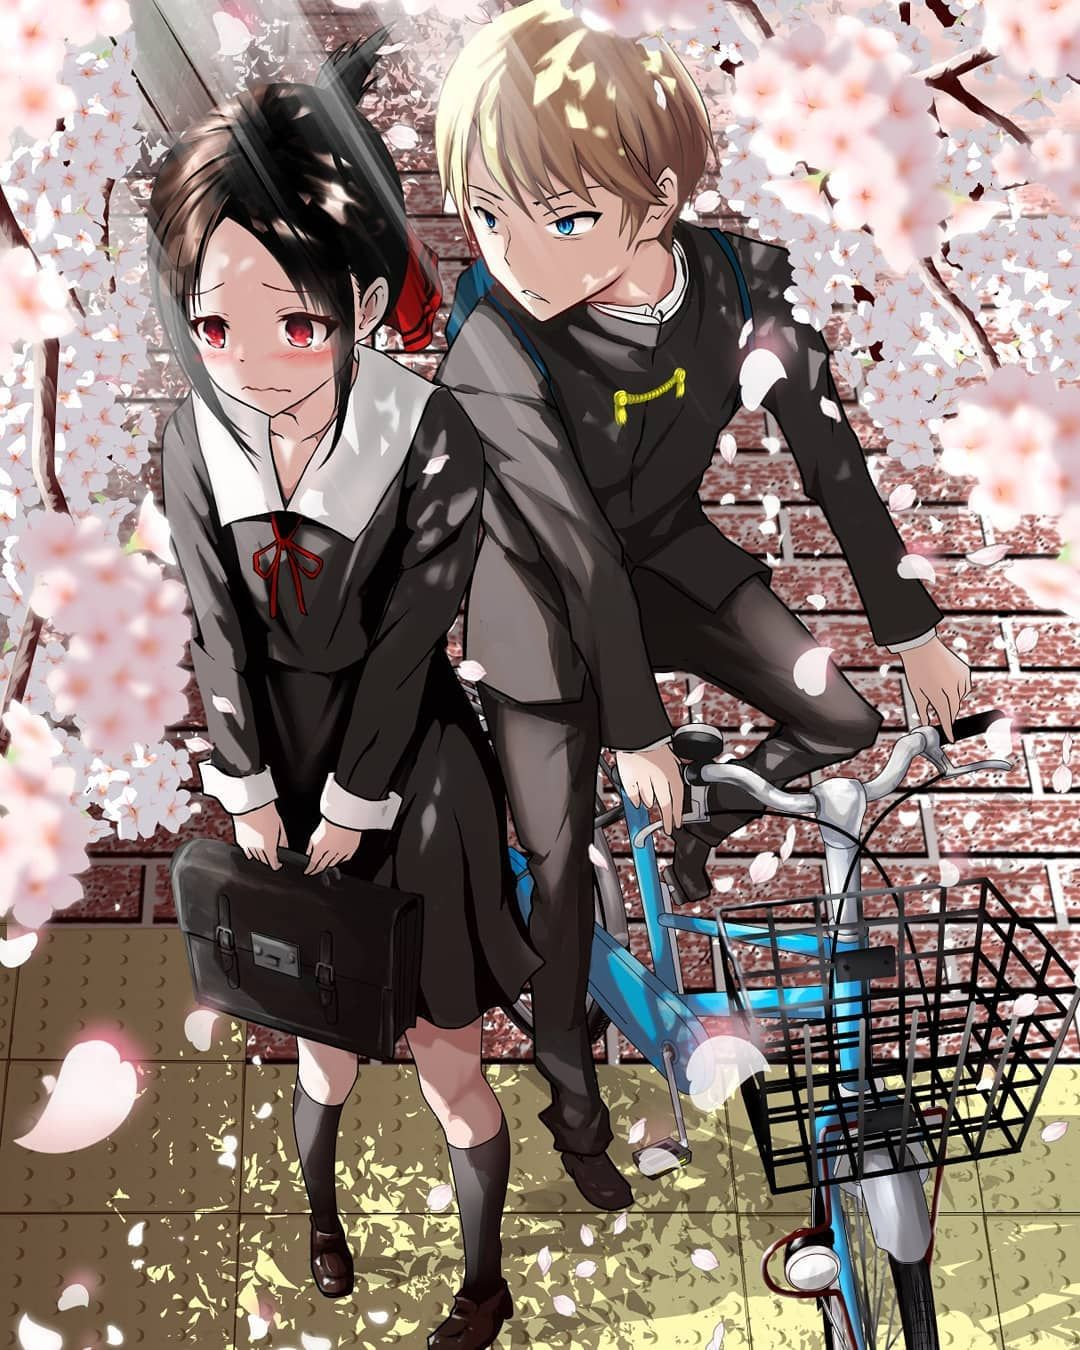 Tu Aimes L Humour Geek Manga Otaku N Hesites Pas A Rejoindre Notre Communaute Sur Les Reseaux Sociaux Anime Anime Characters Kawaii Anime